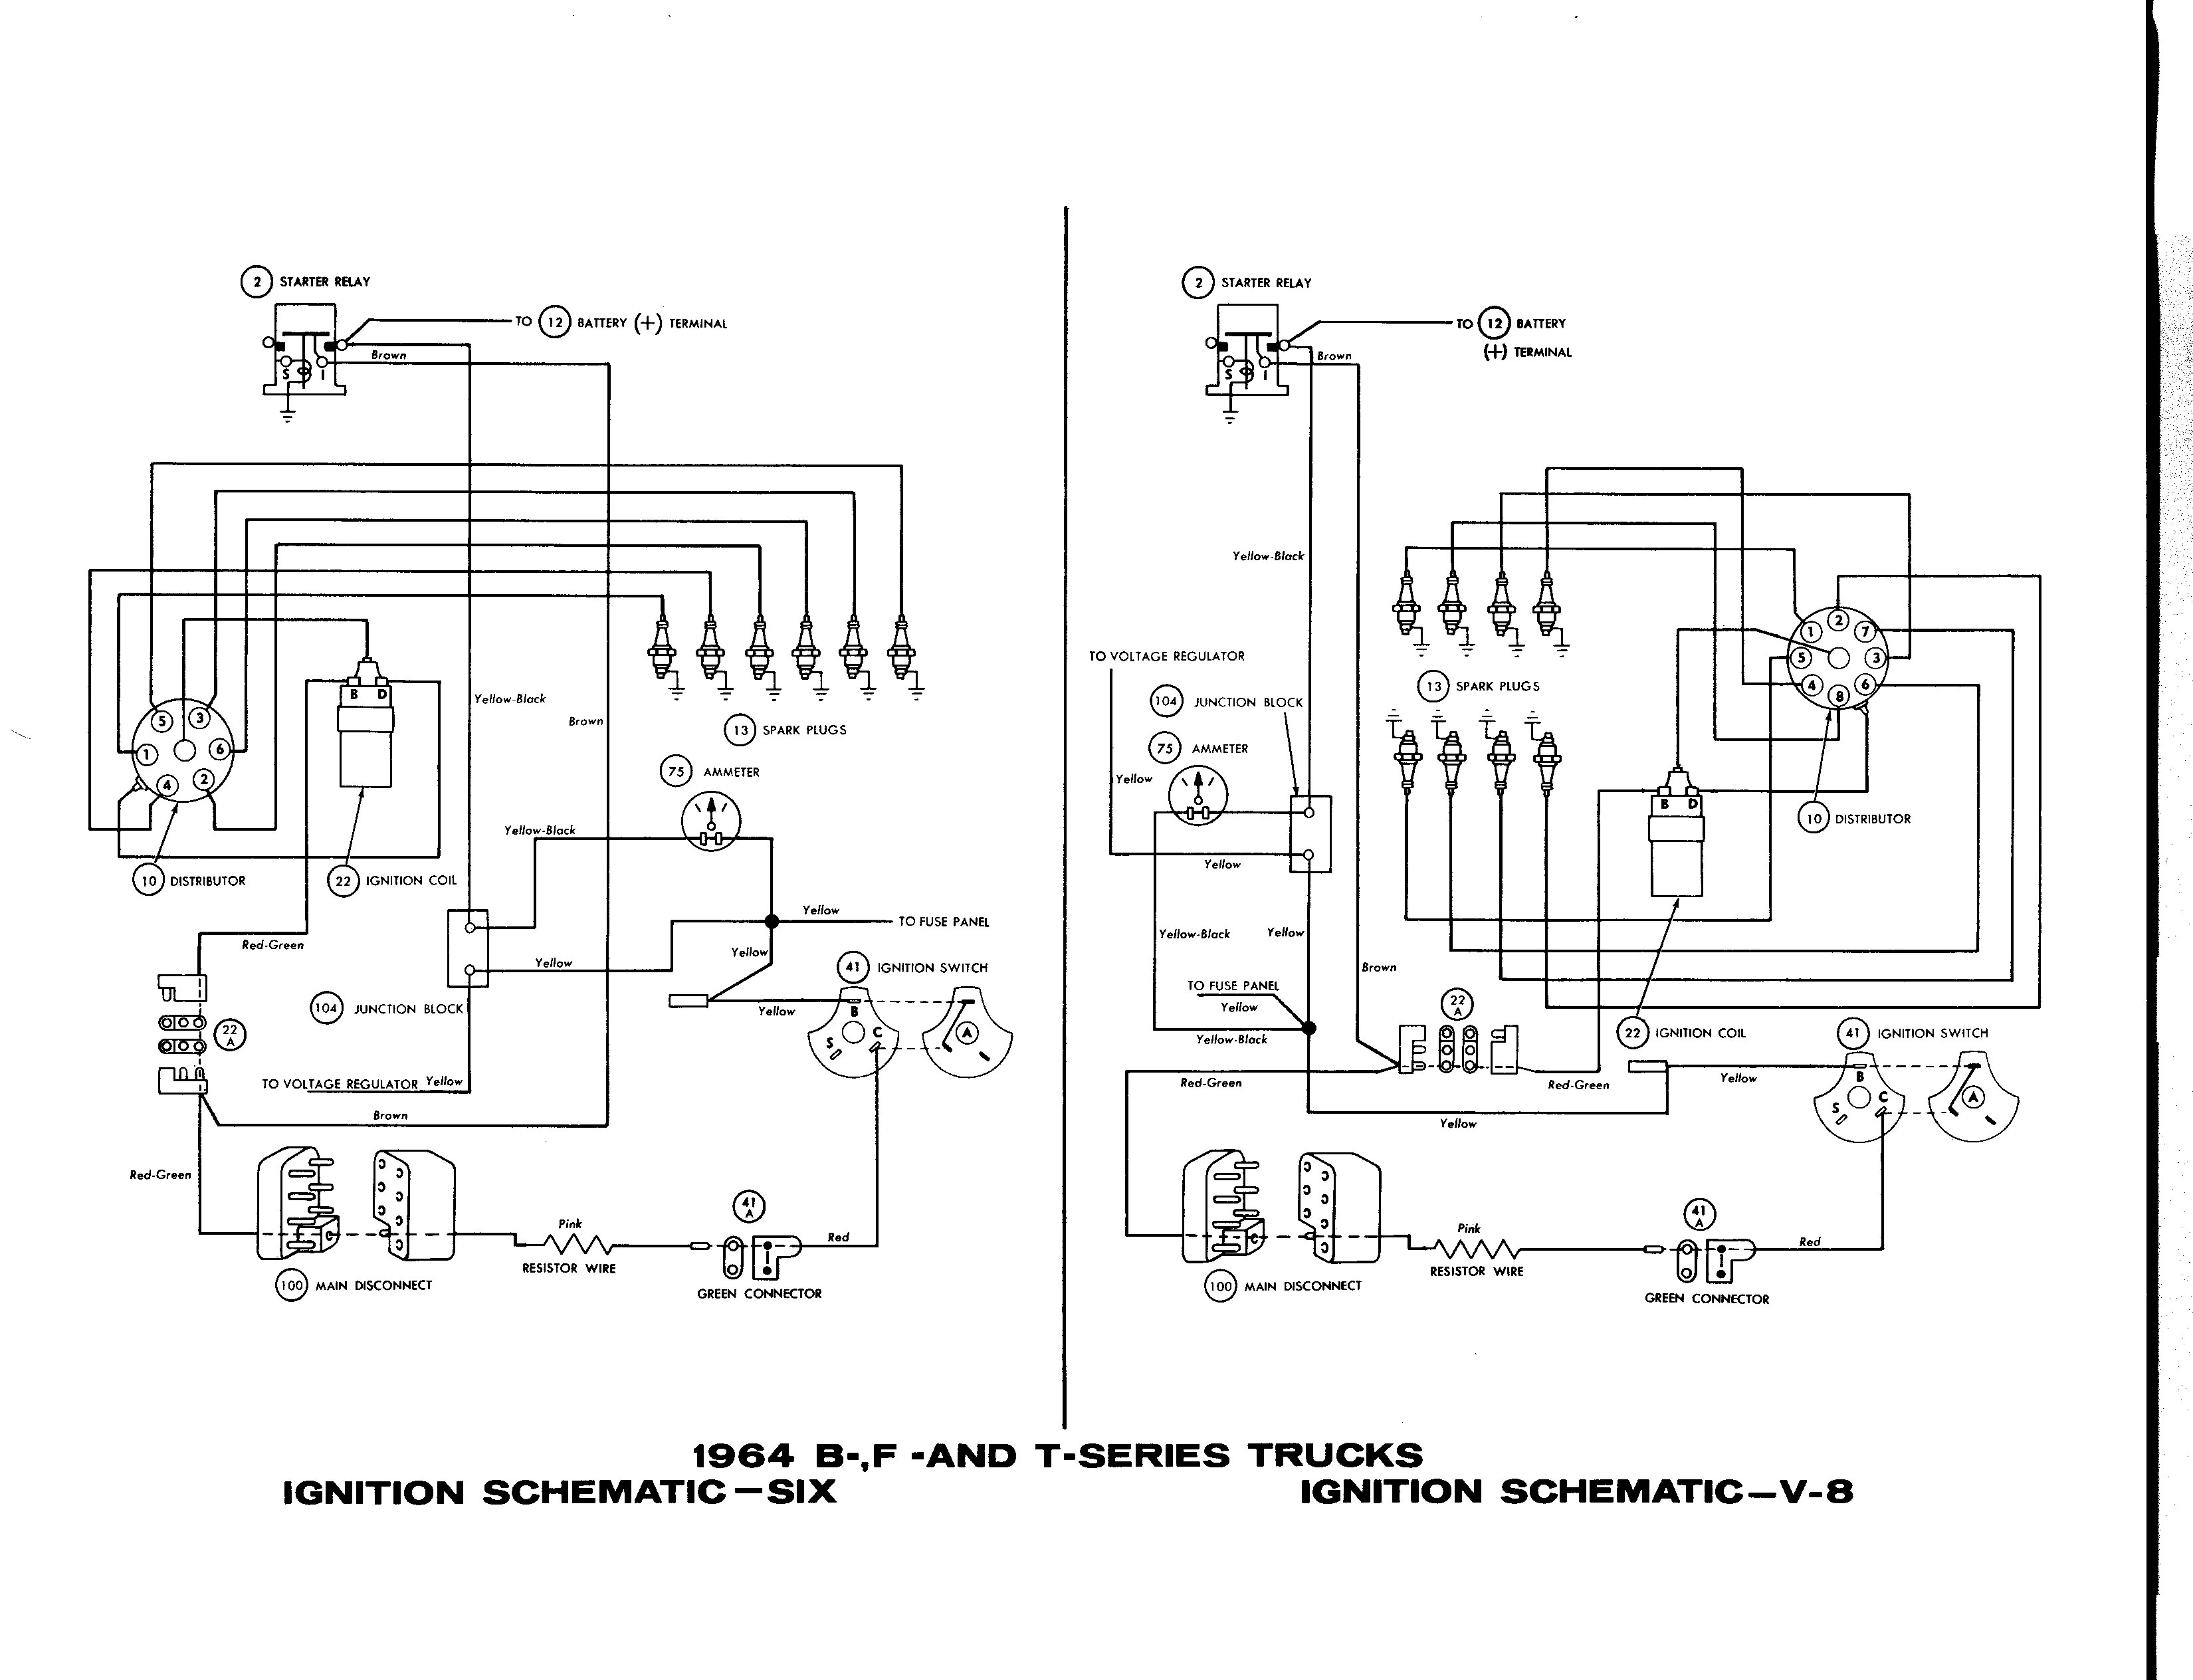 1969 Ford F100 Wiring Diagram Schematic Wiring Diagram